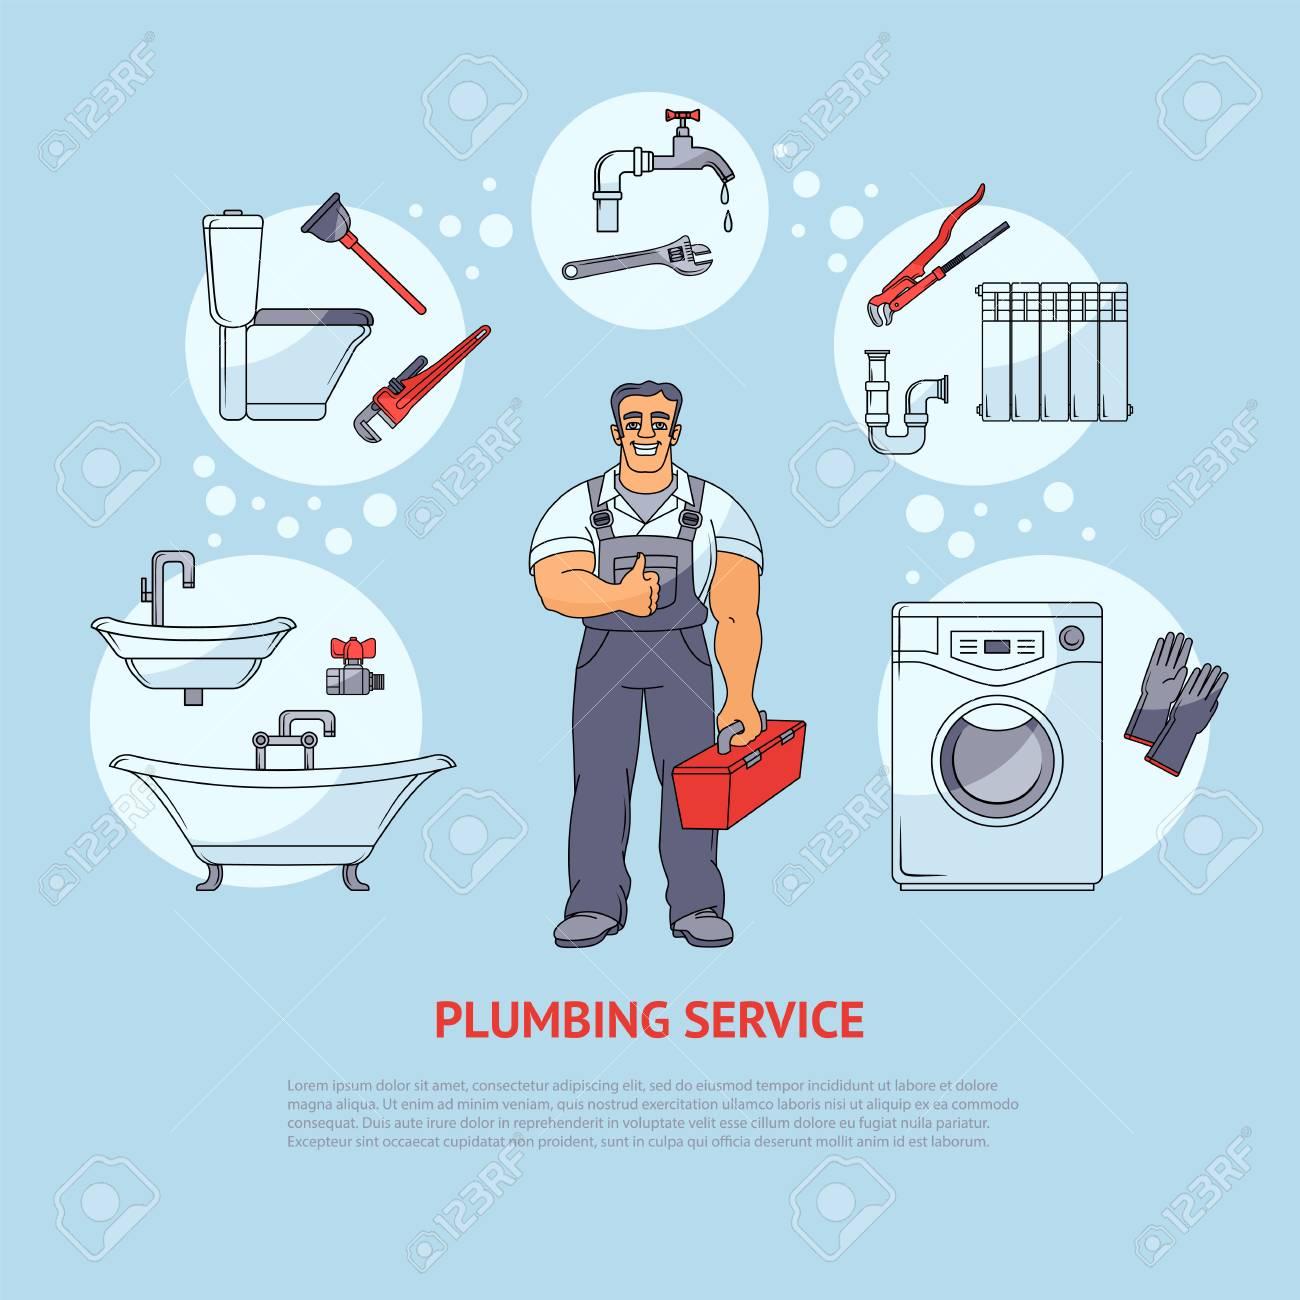 plumbing banner poster leaflet design showing smiling plumber